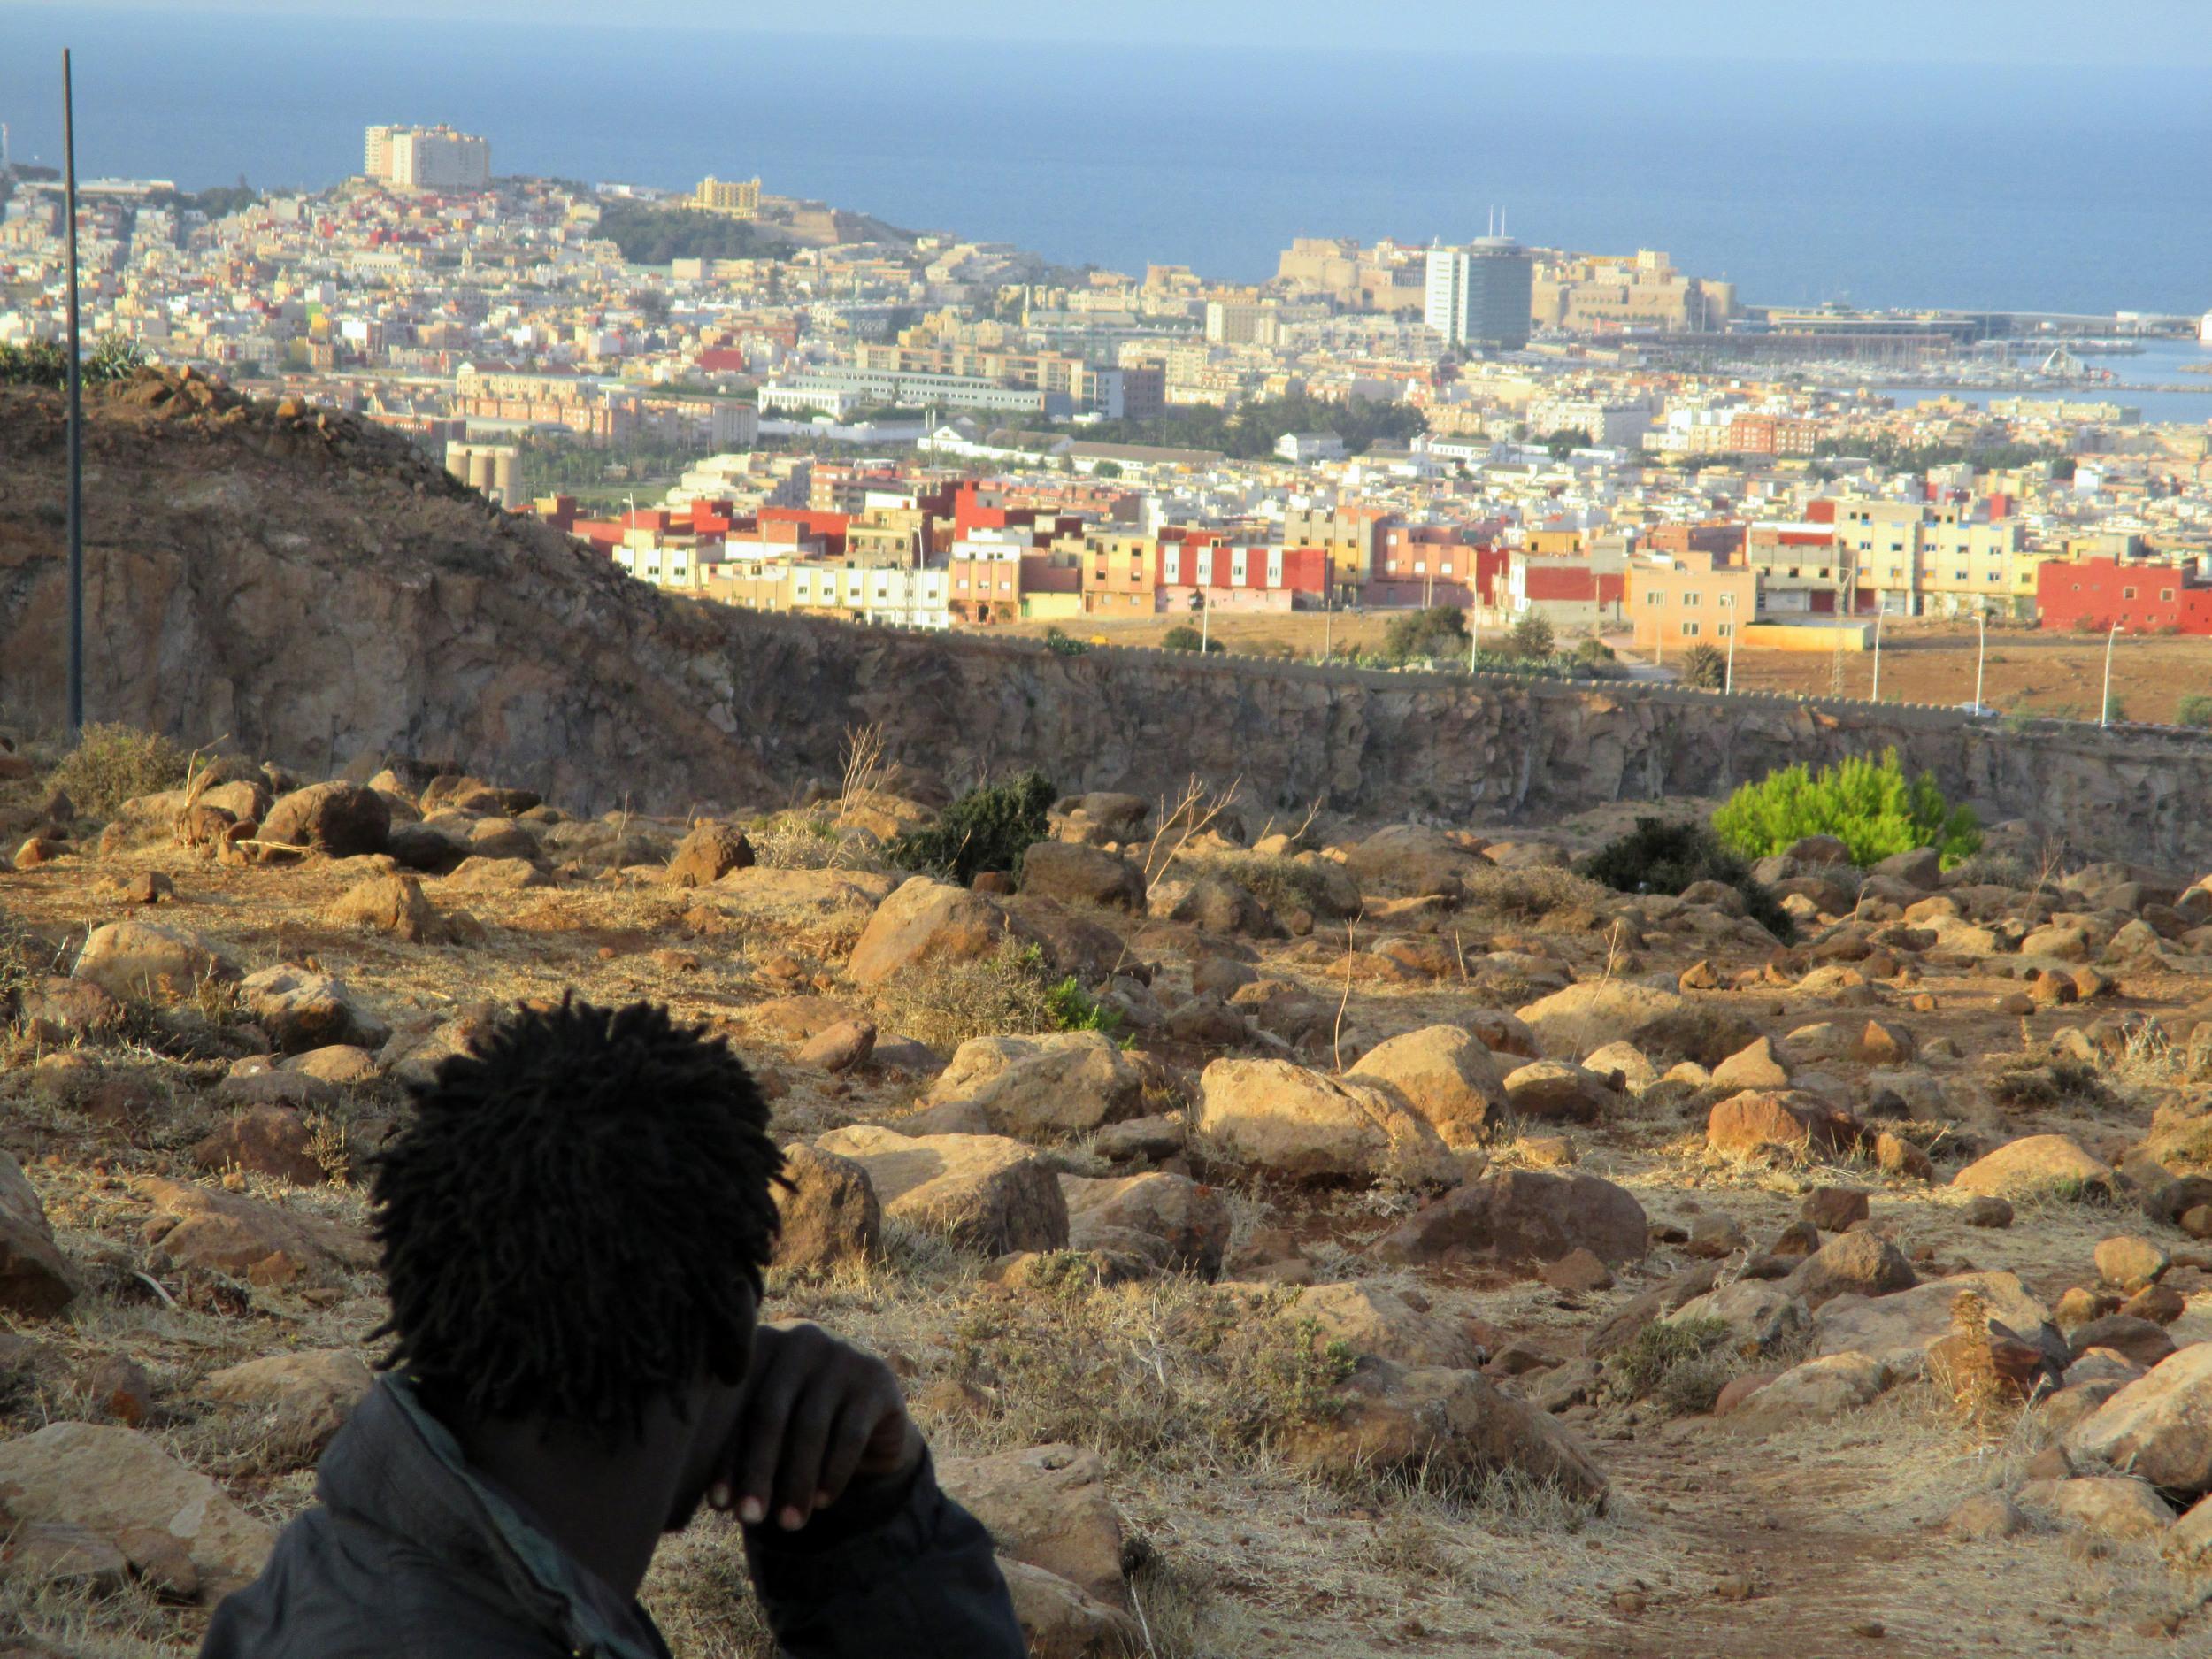 1_MAIN STILL_Abou R looking at Melilla_LES SAUTEURS.jpg